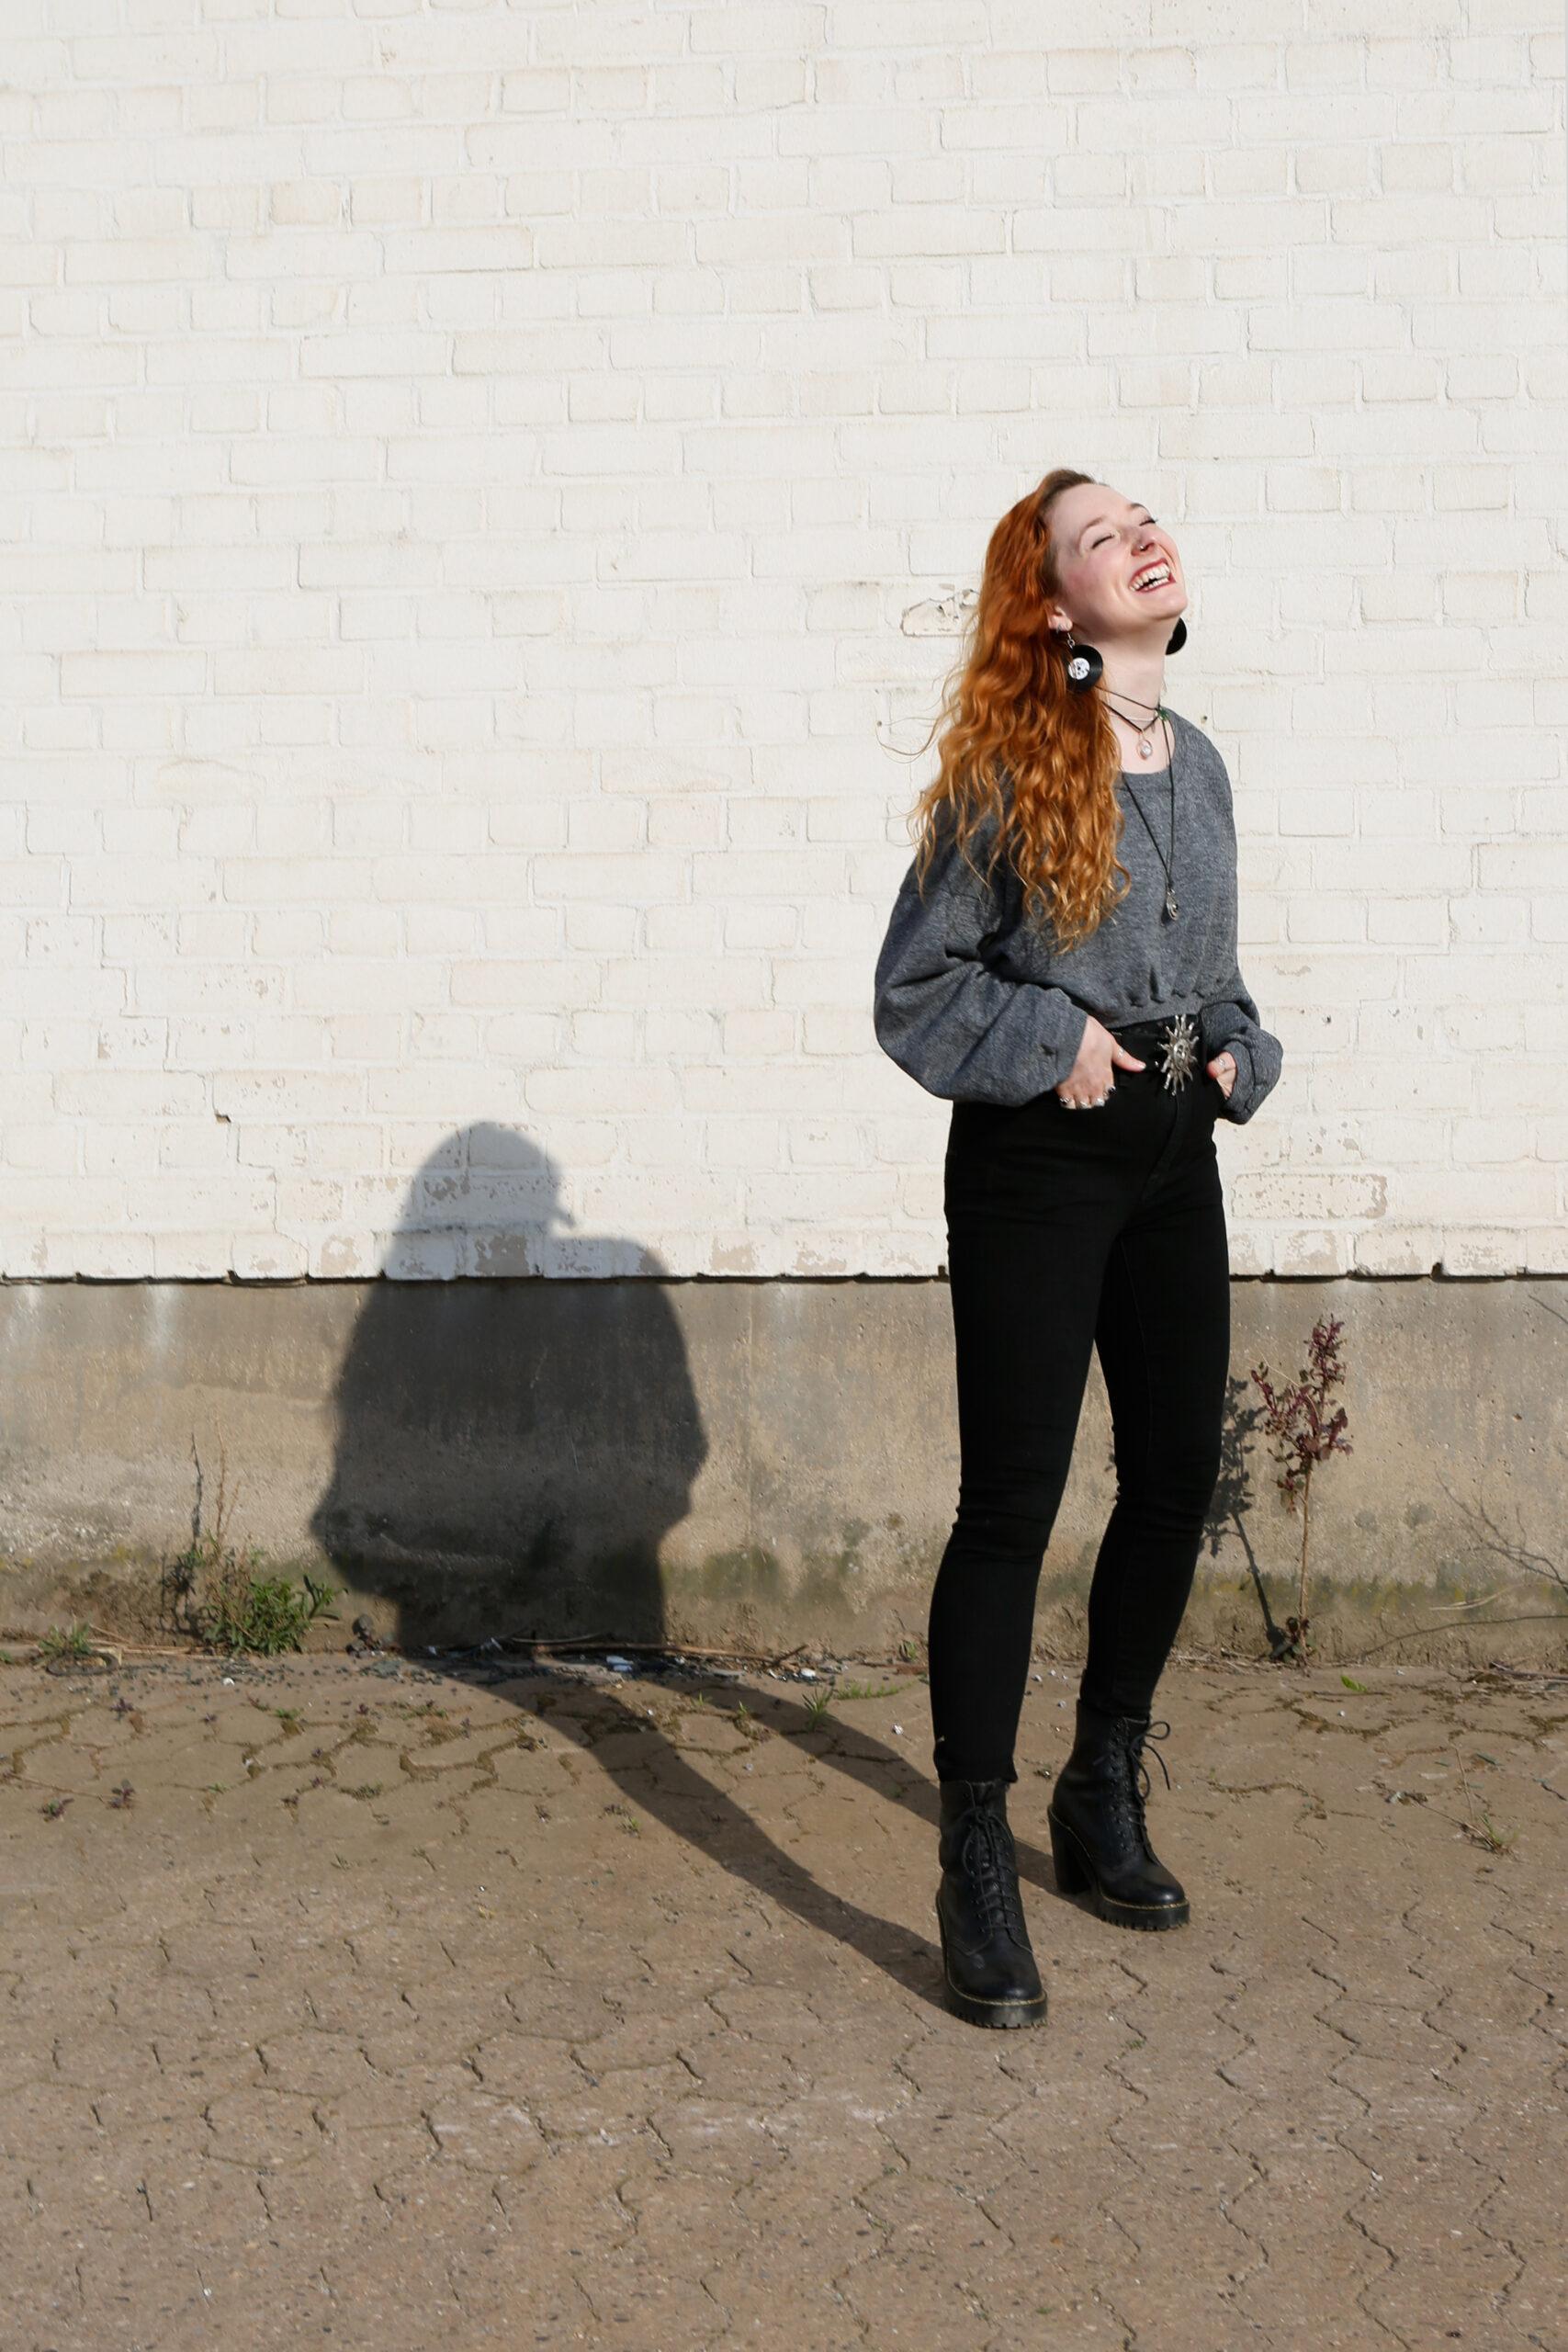 Musikerin Julia Scheeser